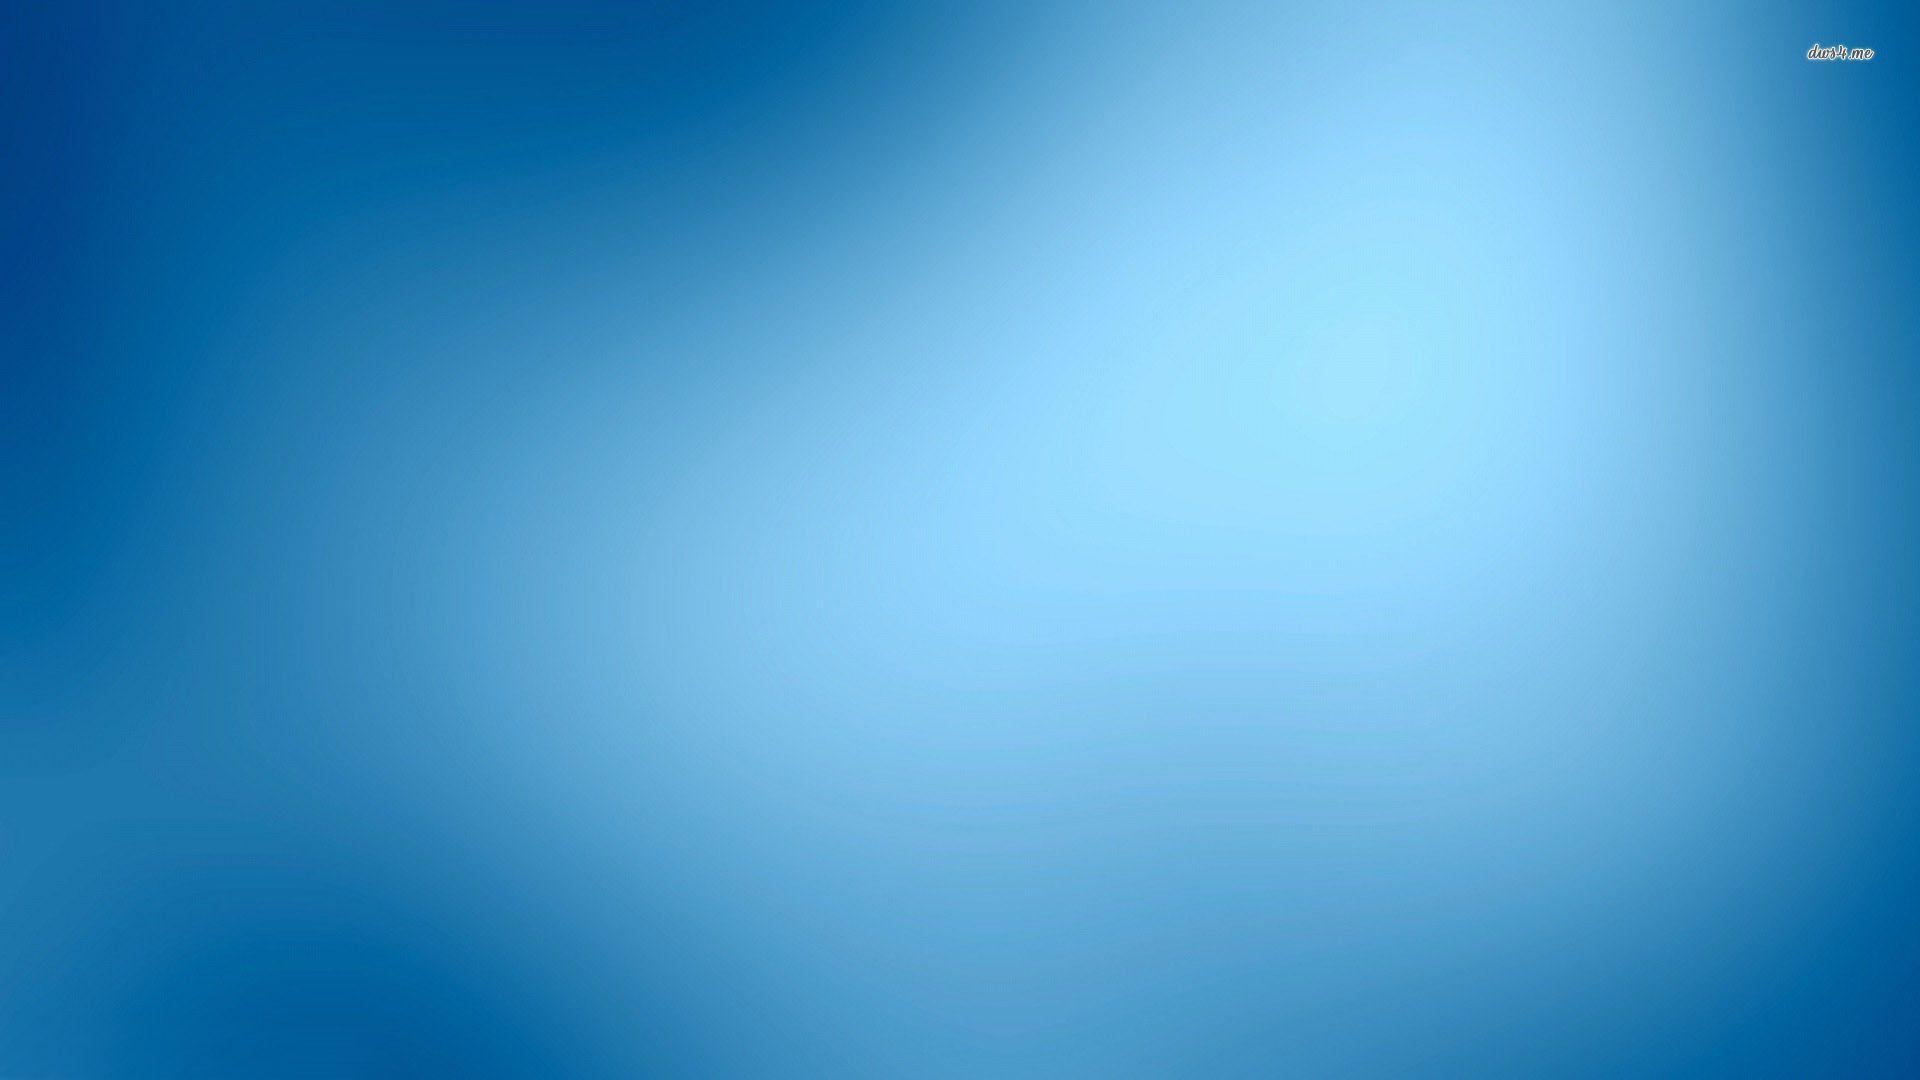 wallpaper background gradient blue - photo #8